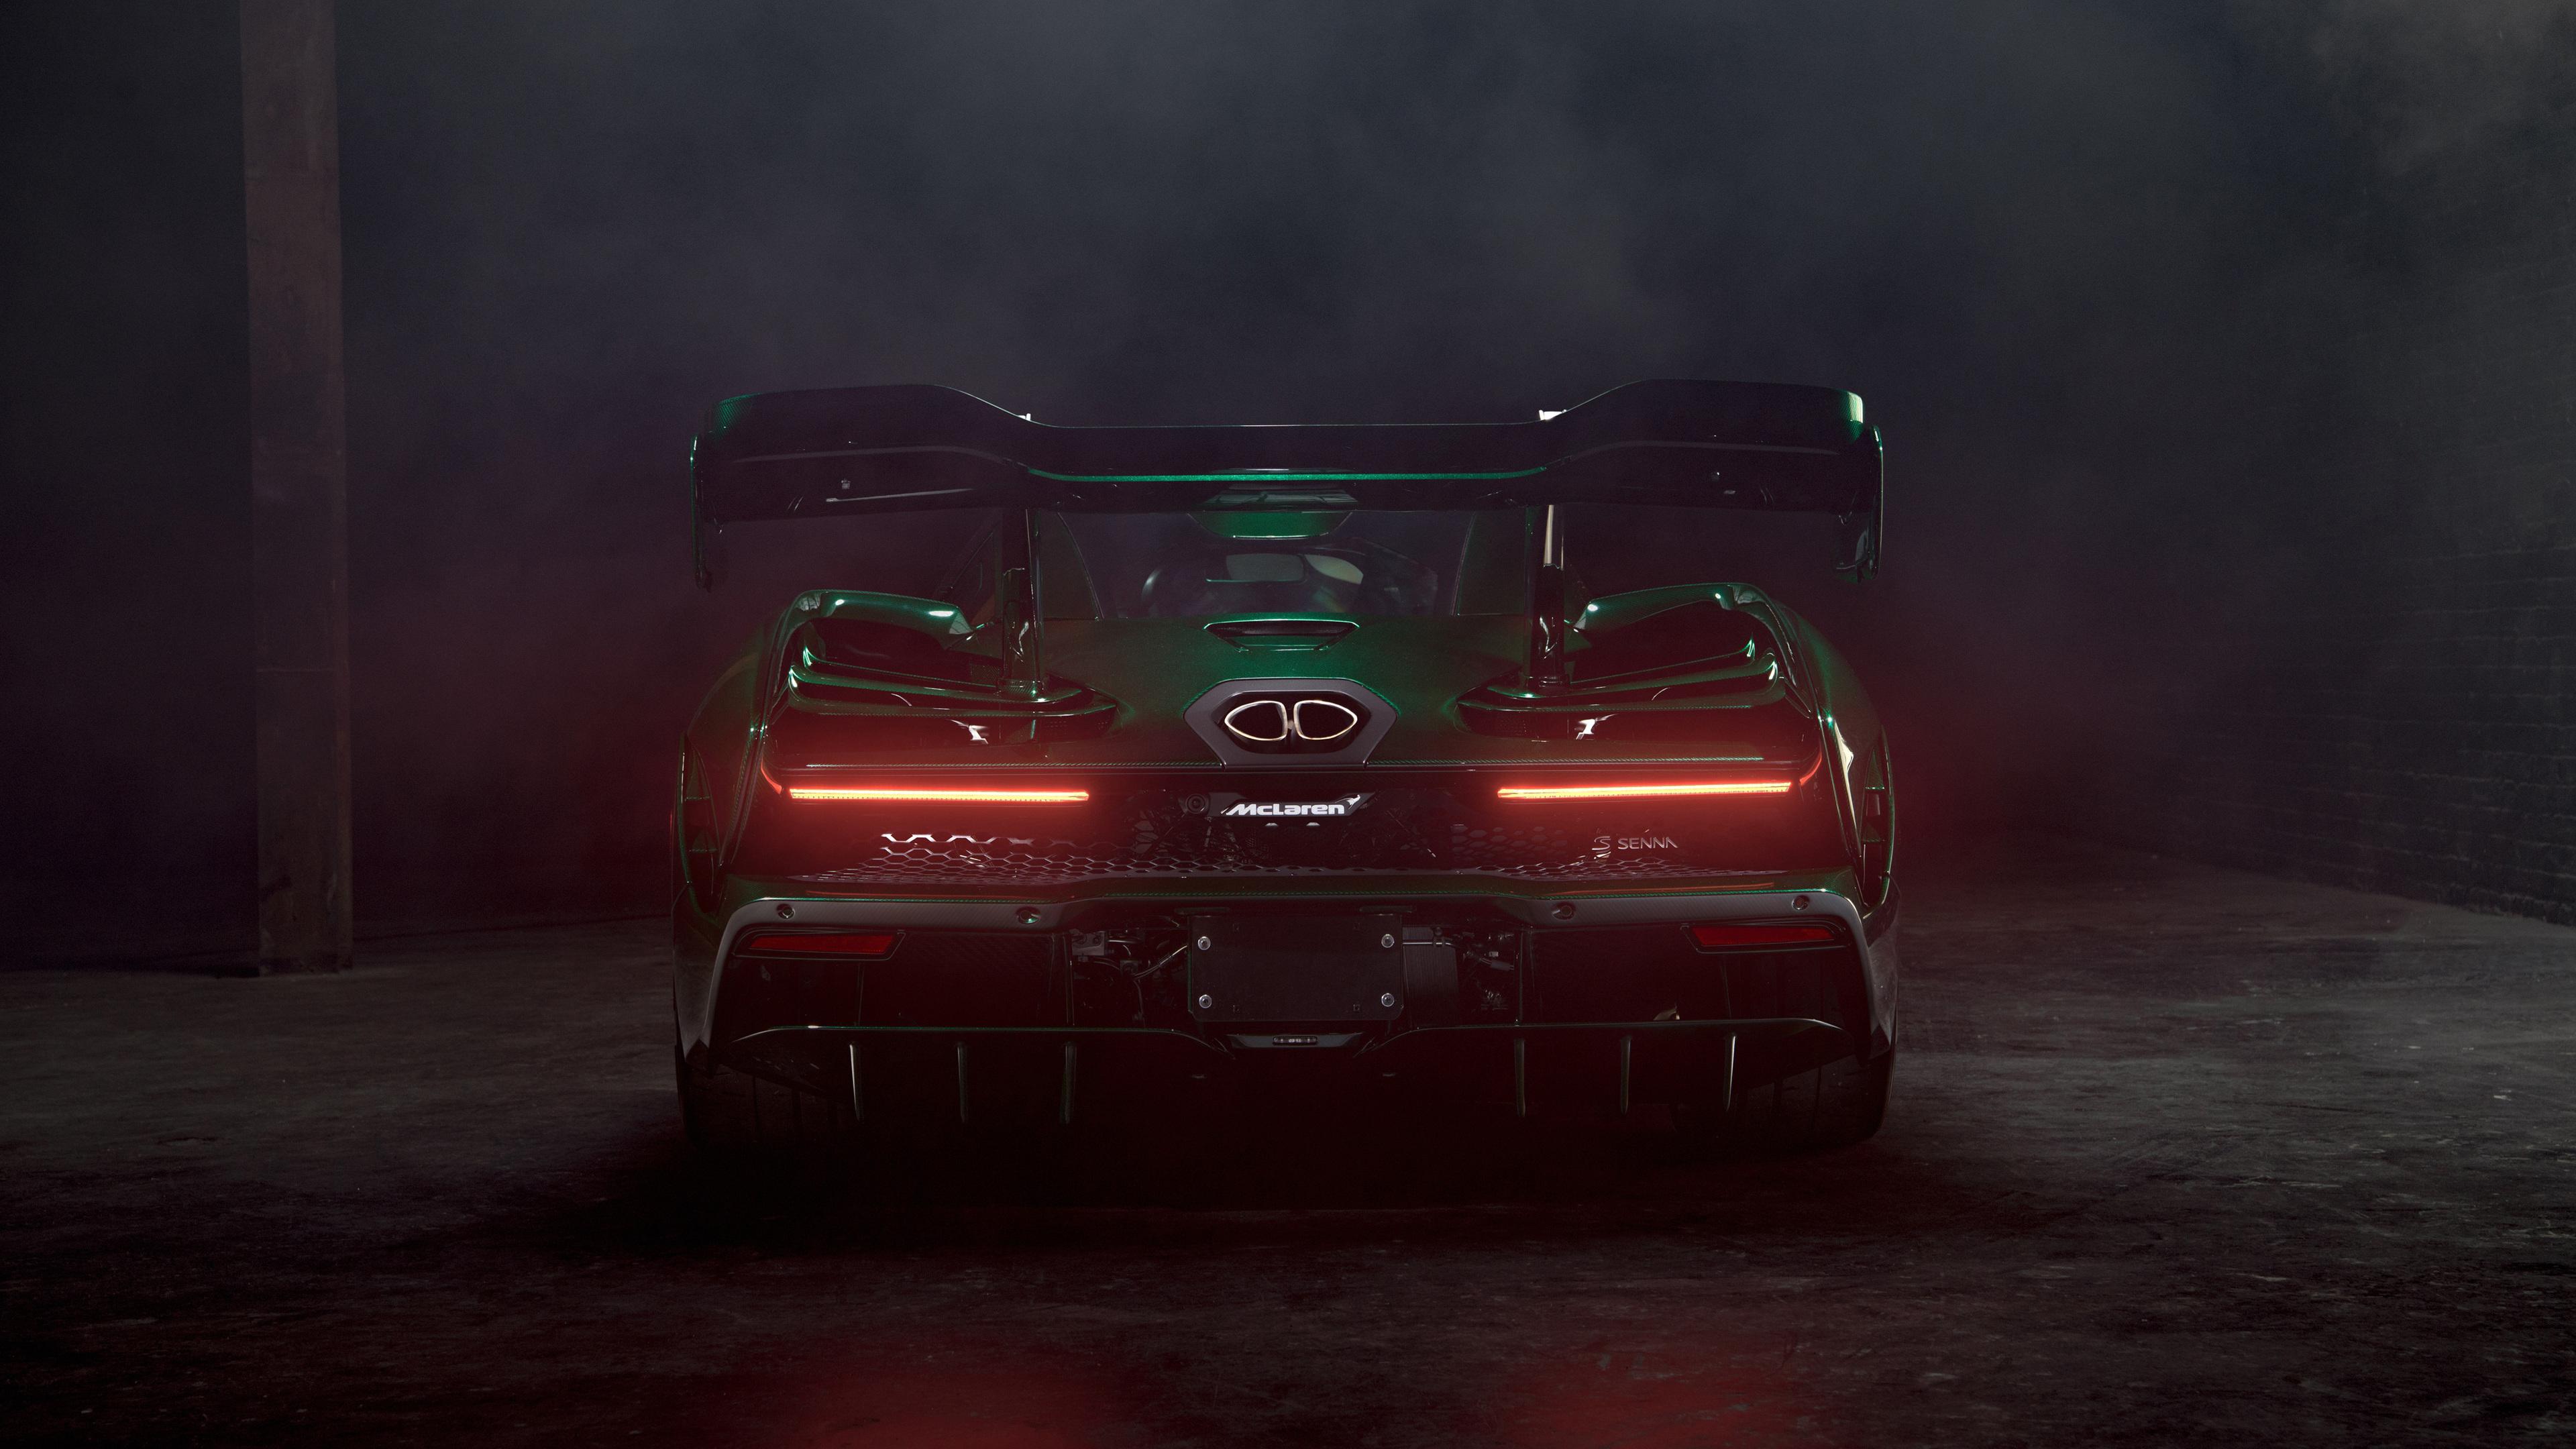 mclaren mso senna 2018 rear 1539112589 - McLaren MSO Senna 2018 Rear - mclaren wallpapers, mclaren senna wallpapers, hd-wallpapers, cars wallpapers, 4k-wallpapers, 2018 cars wallpapers